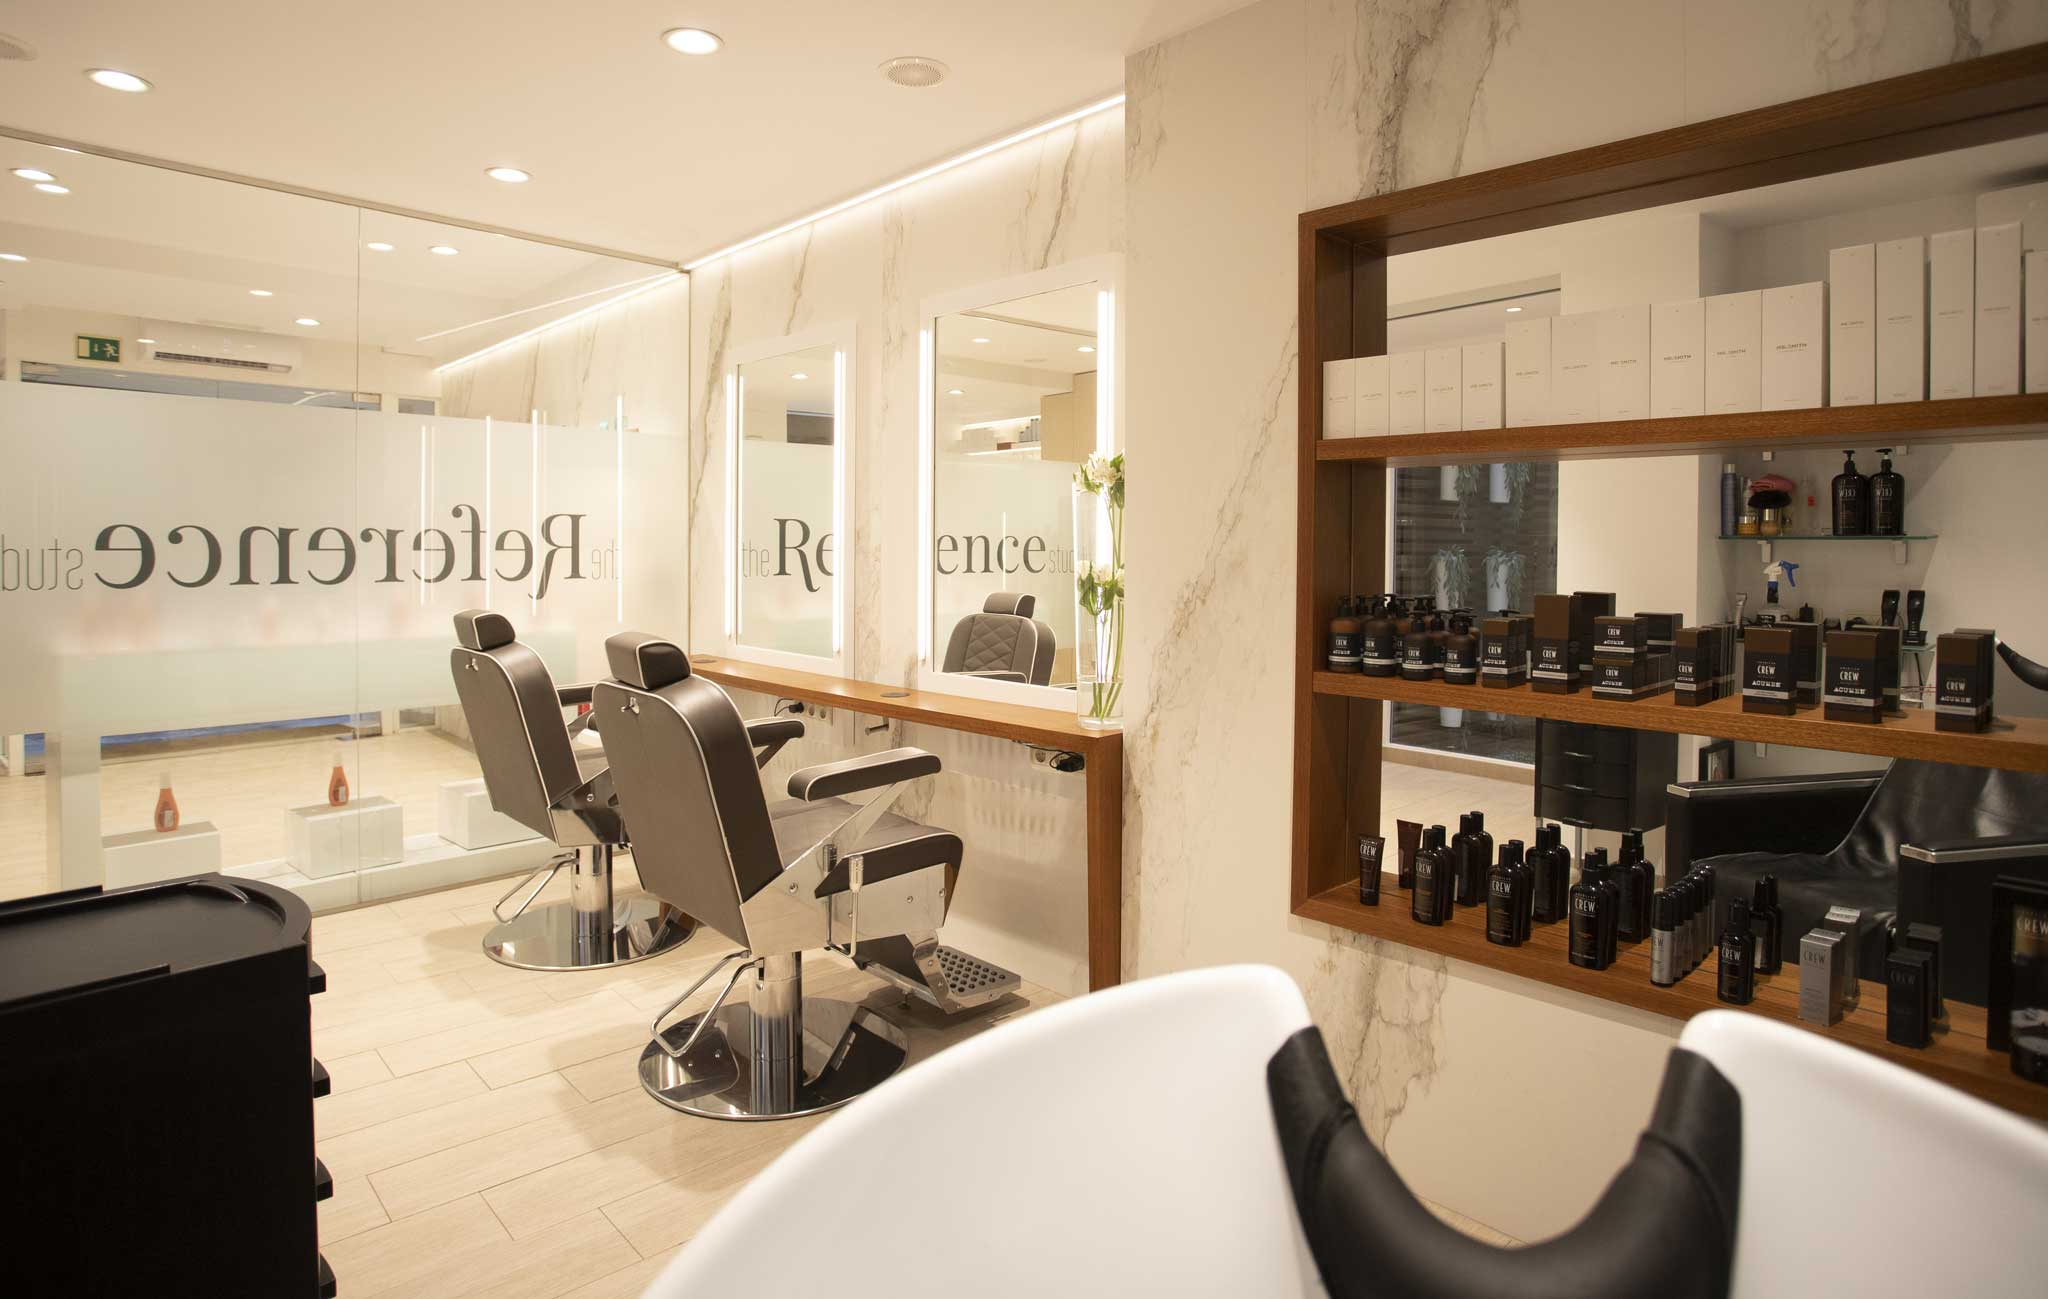 Mejor salon de peluqueria en Denia – The Reference Studio